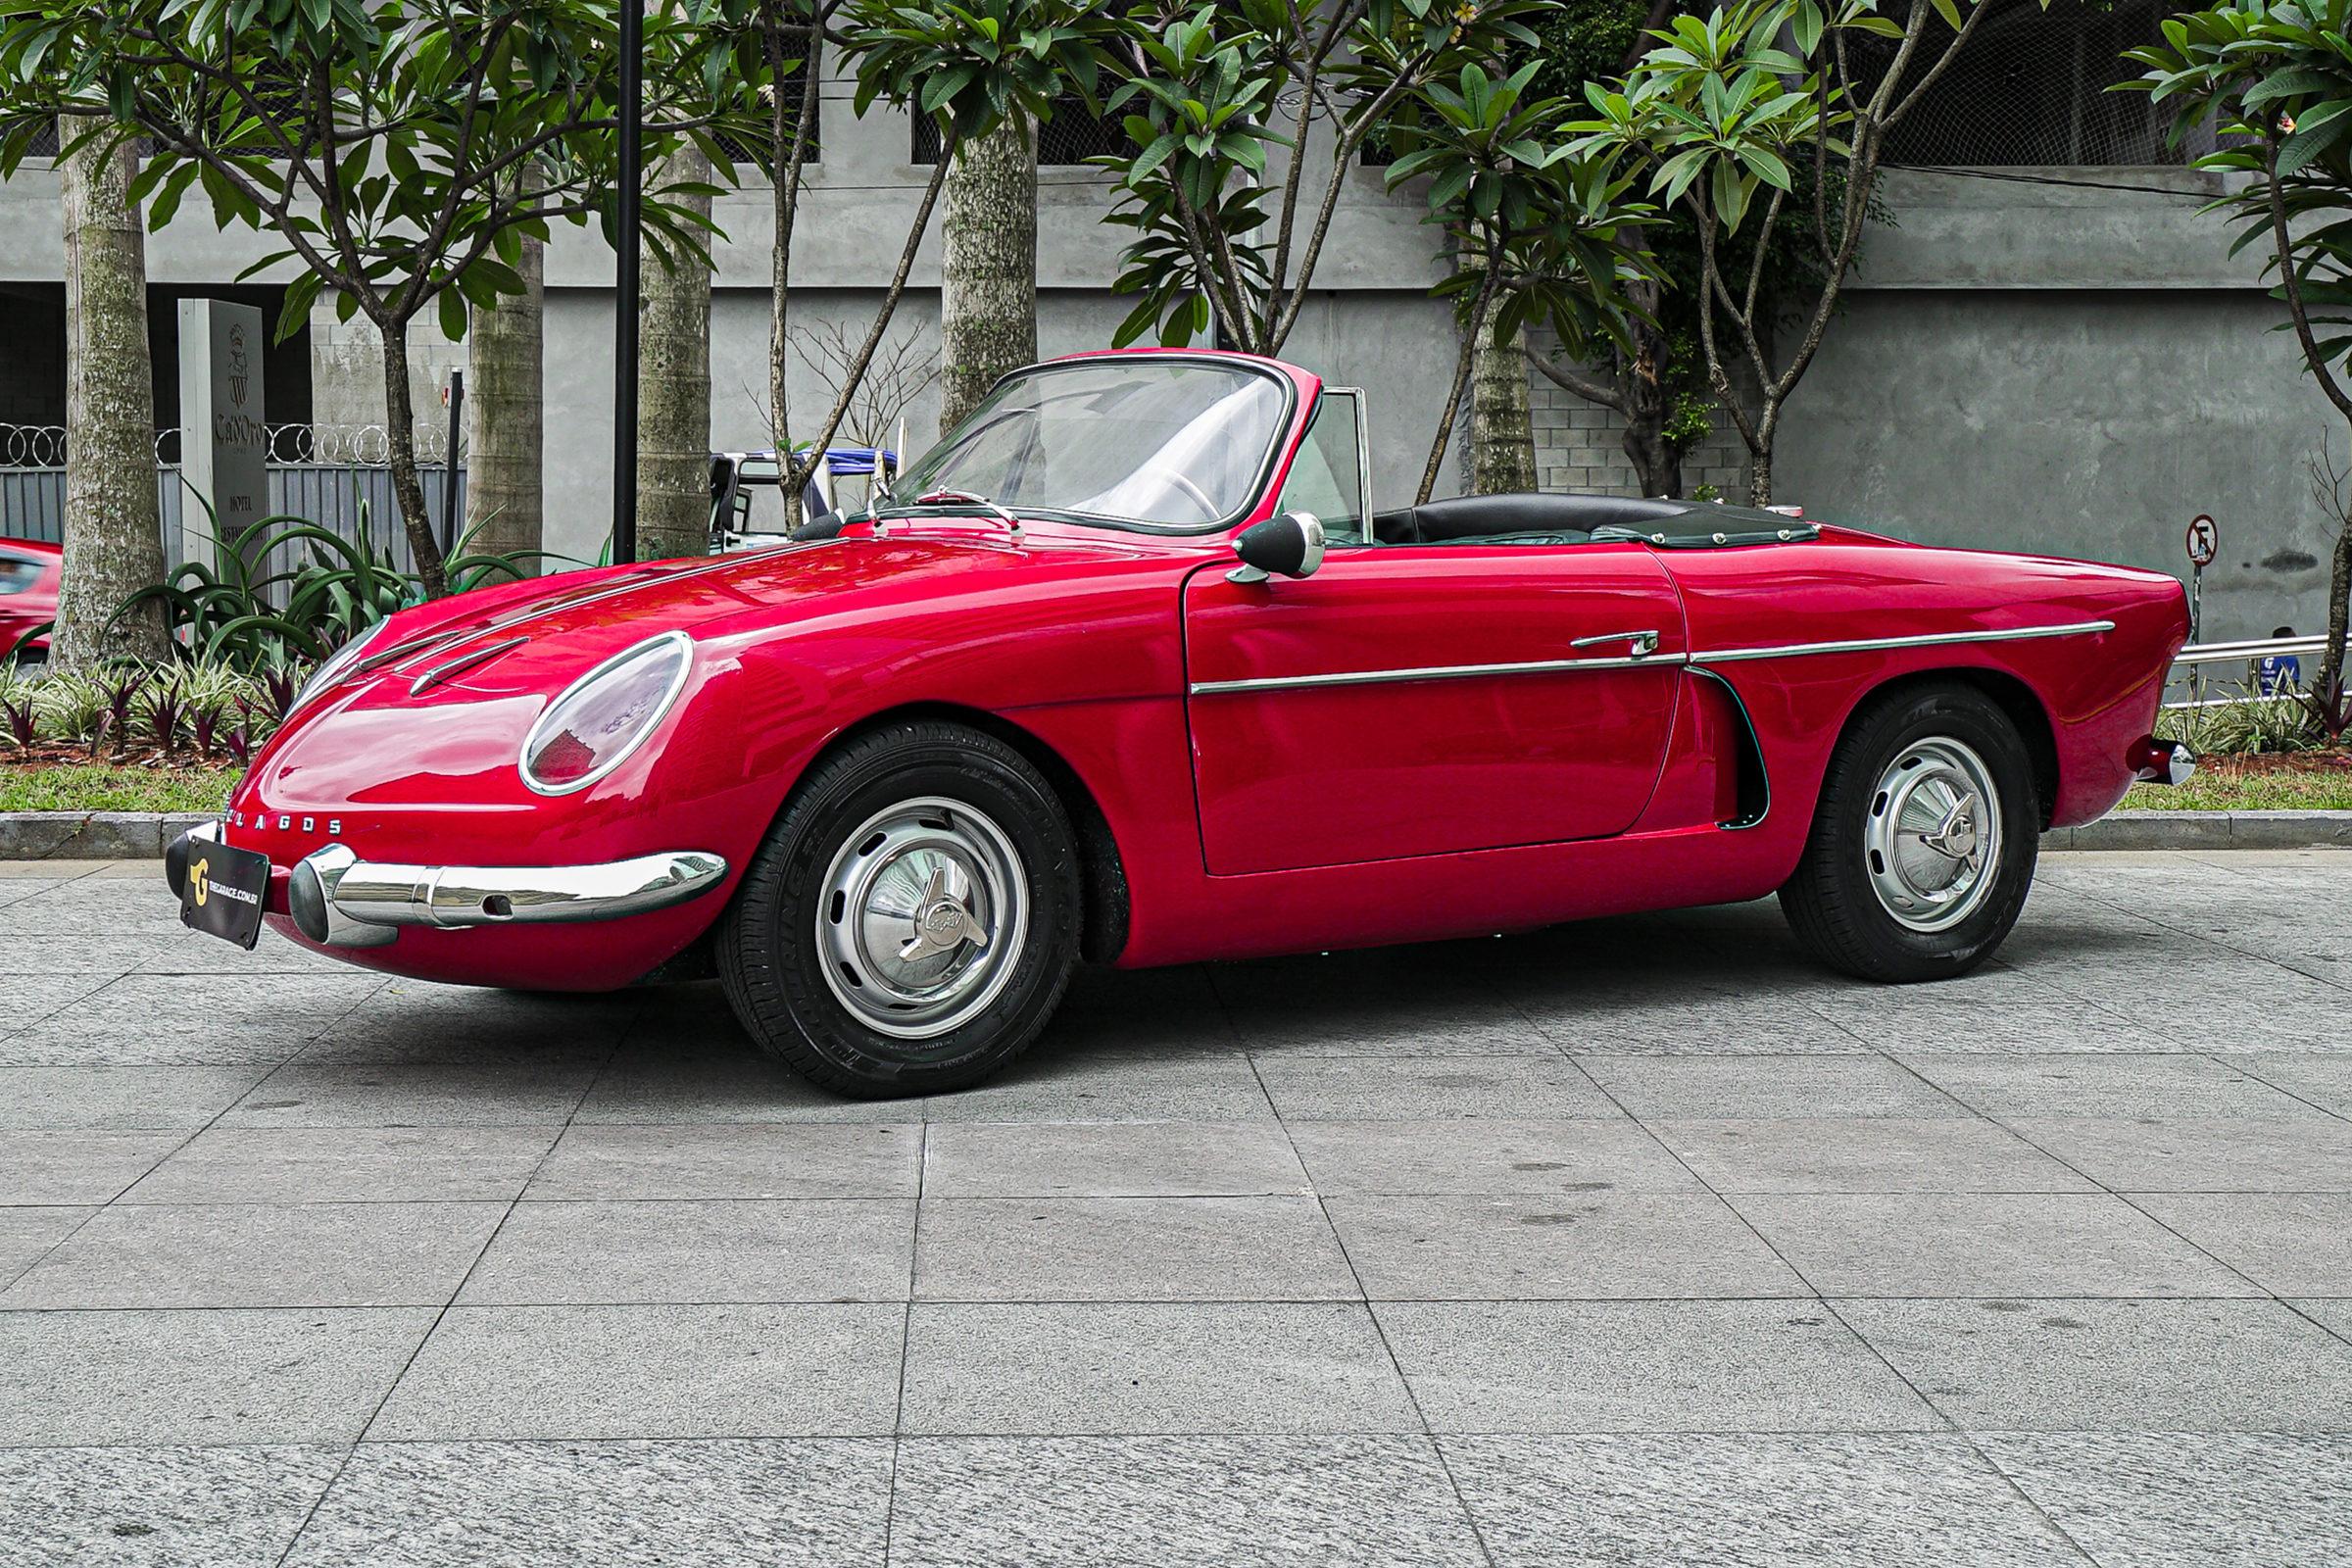 1963 Willys Interlagos Conversível - The Garage